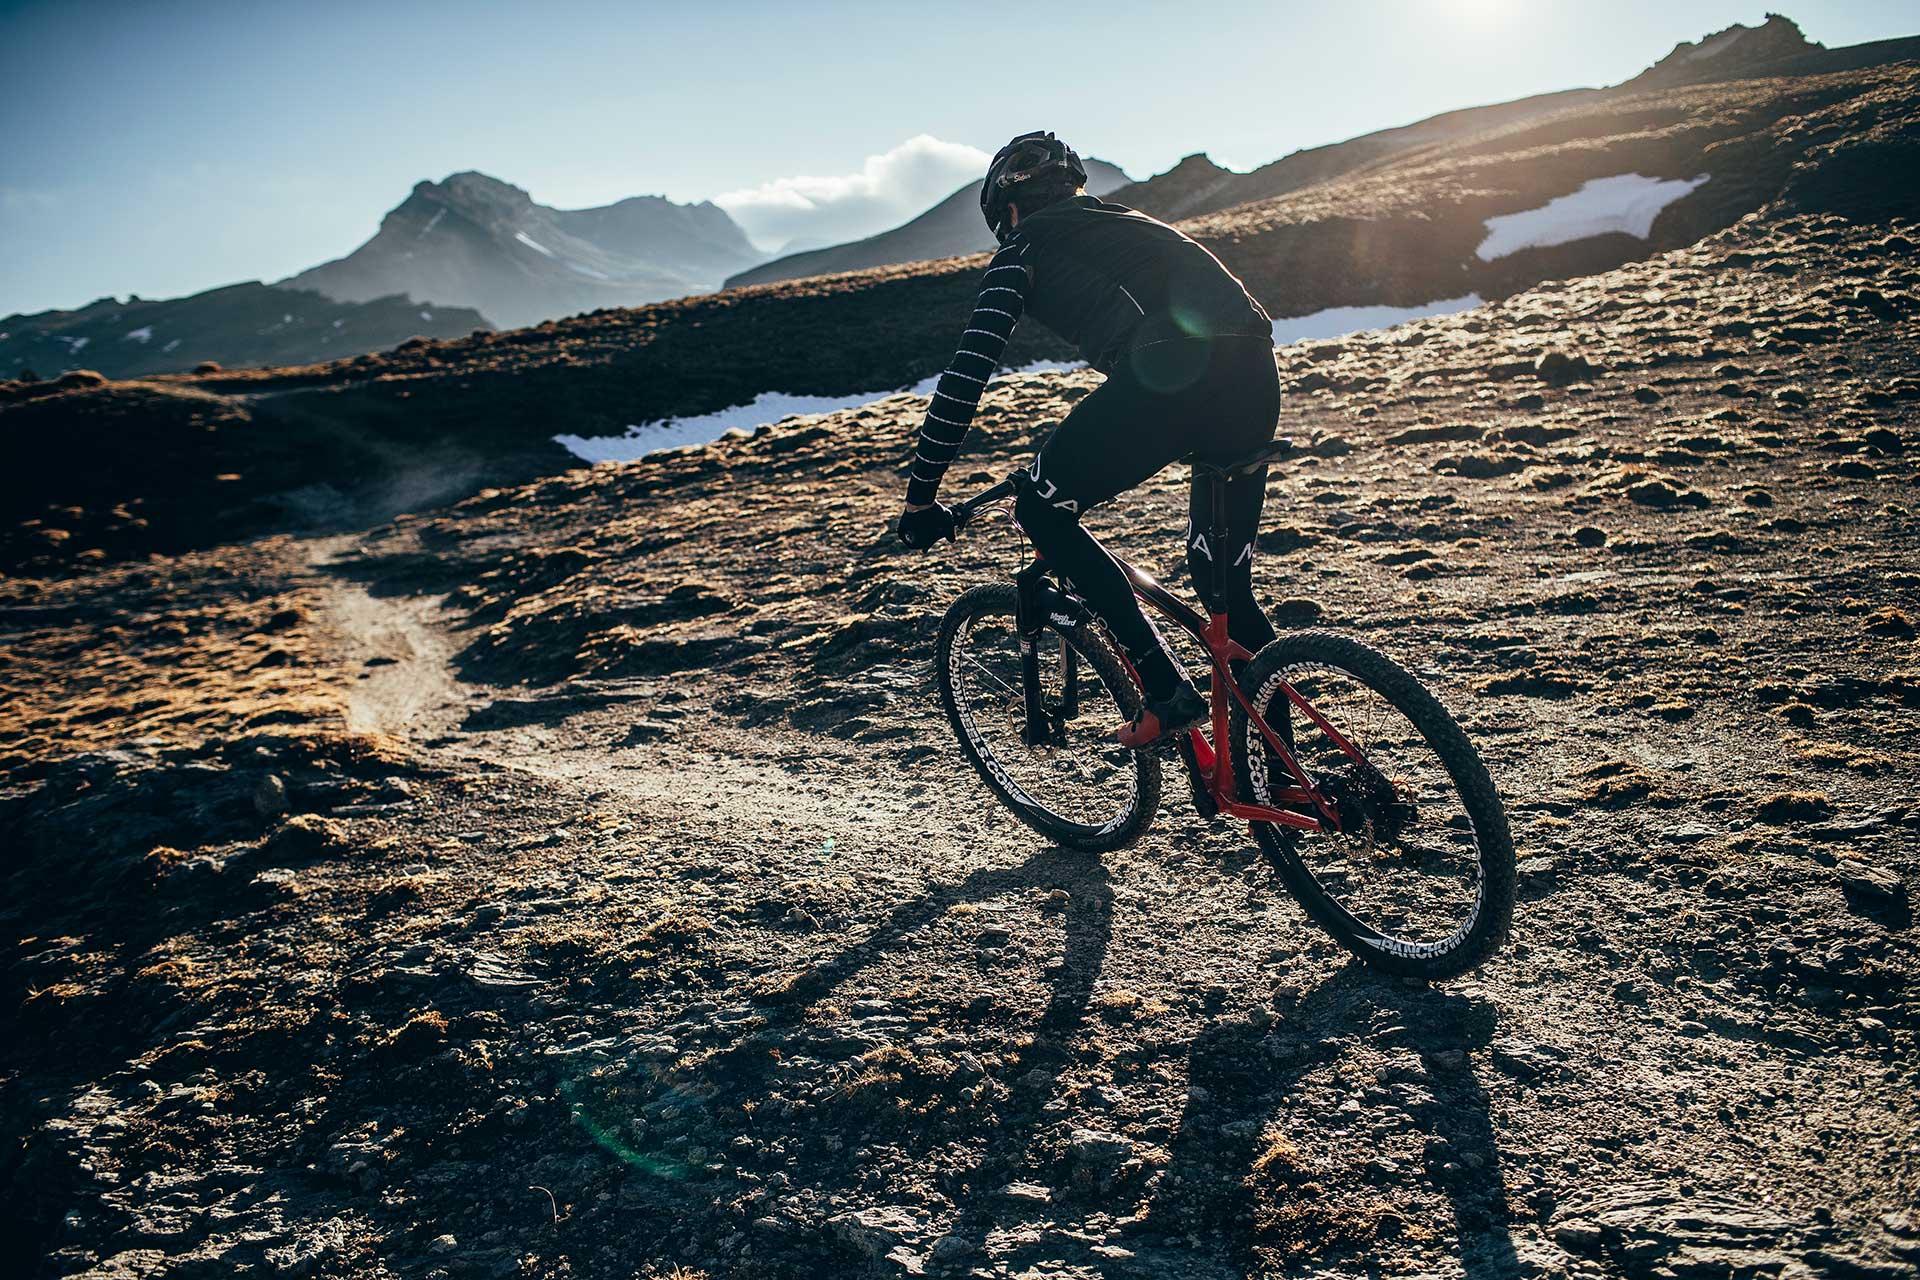 Aktion Sport Fotograf Michael Müller Berge Köln Mountainbike Moloja